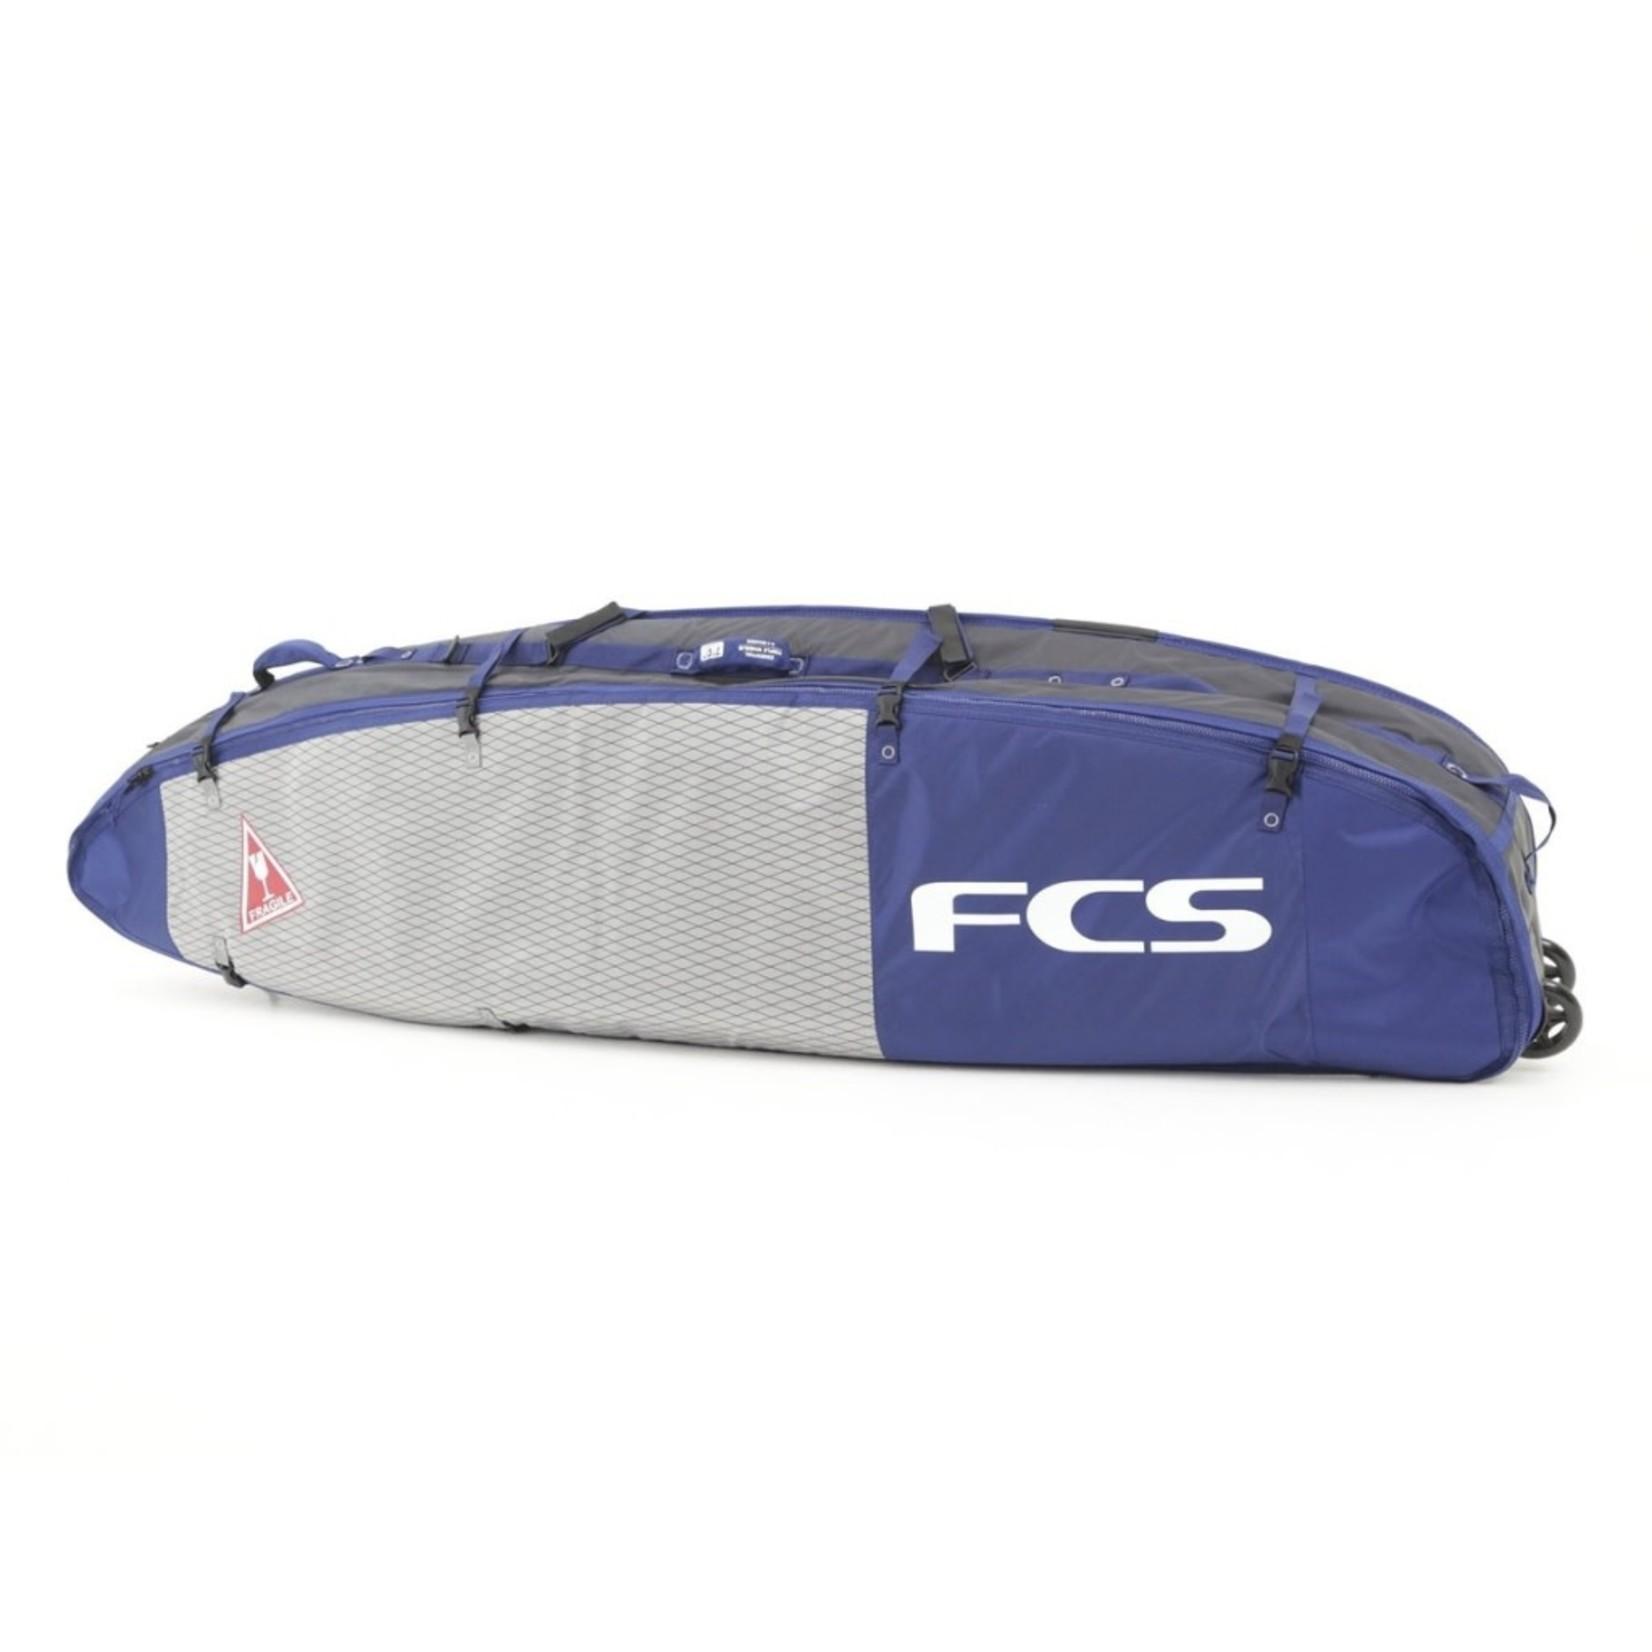 FCS FCS Triple Wheelie All Purpose Travel Cover 7'6